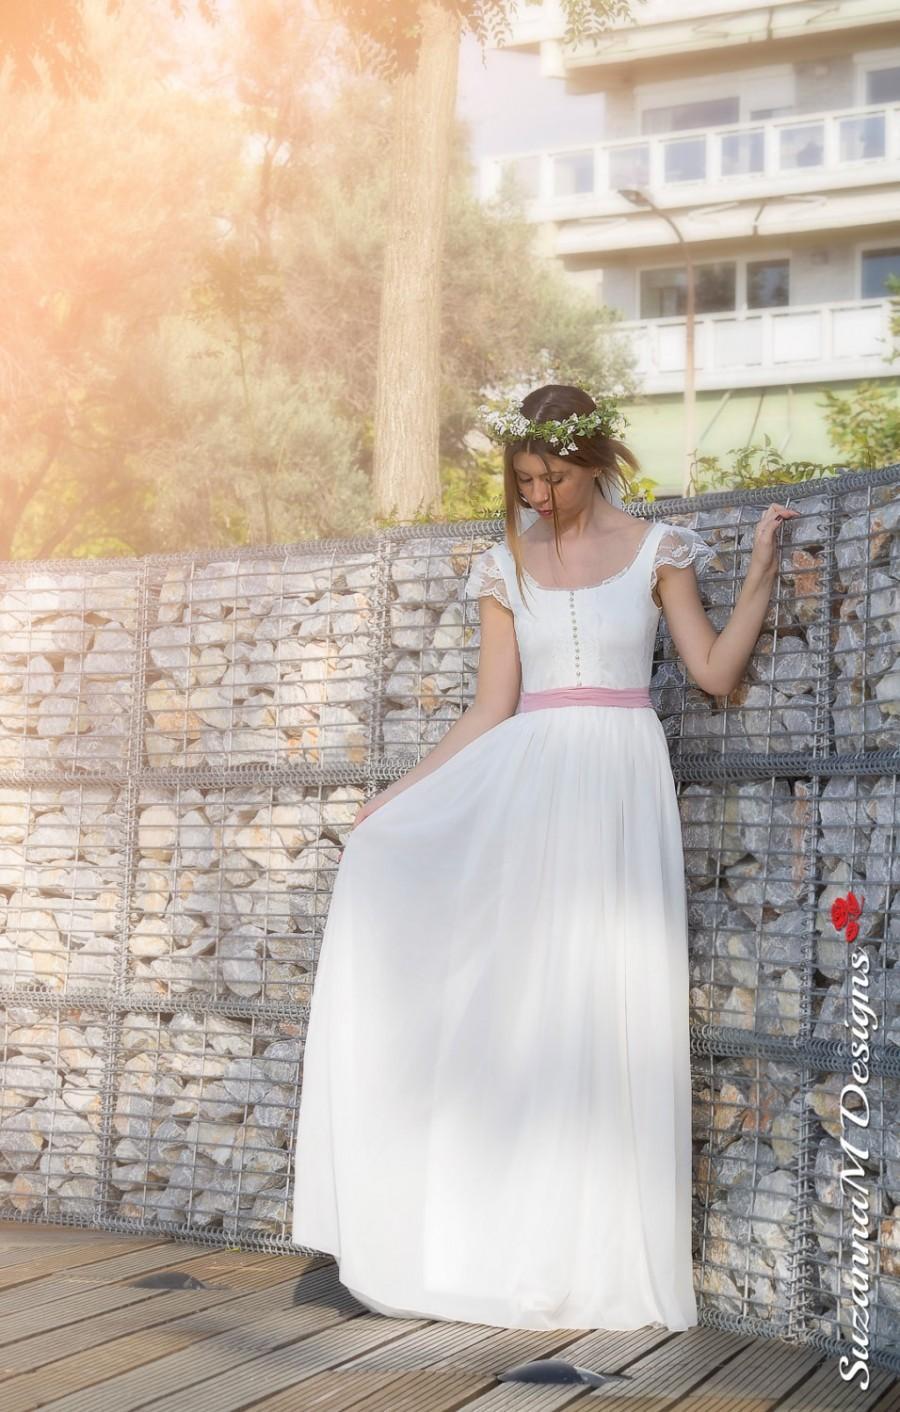 Mariage - Bohemian Wedding Dress, Bohemian Bridal Dress, Bohemian Bridal Gown, Bohemian Wedding Gown, Ivory Wedding Dress, Sleeveless Wedding Dress